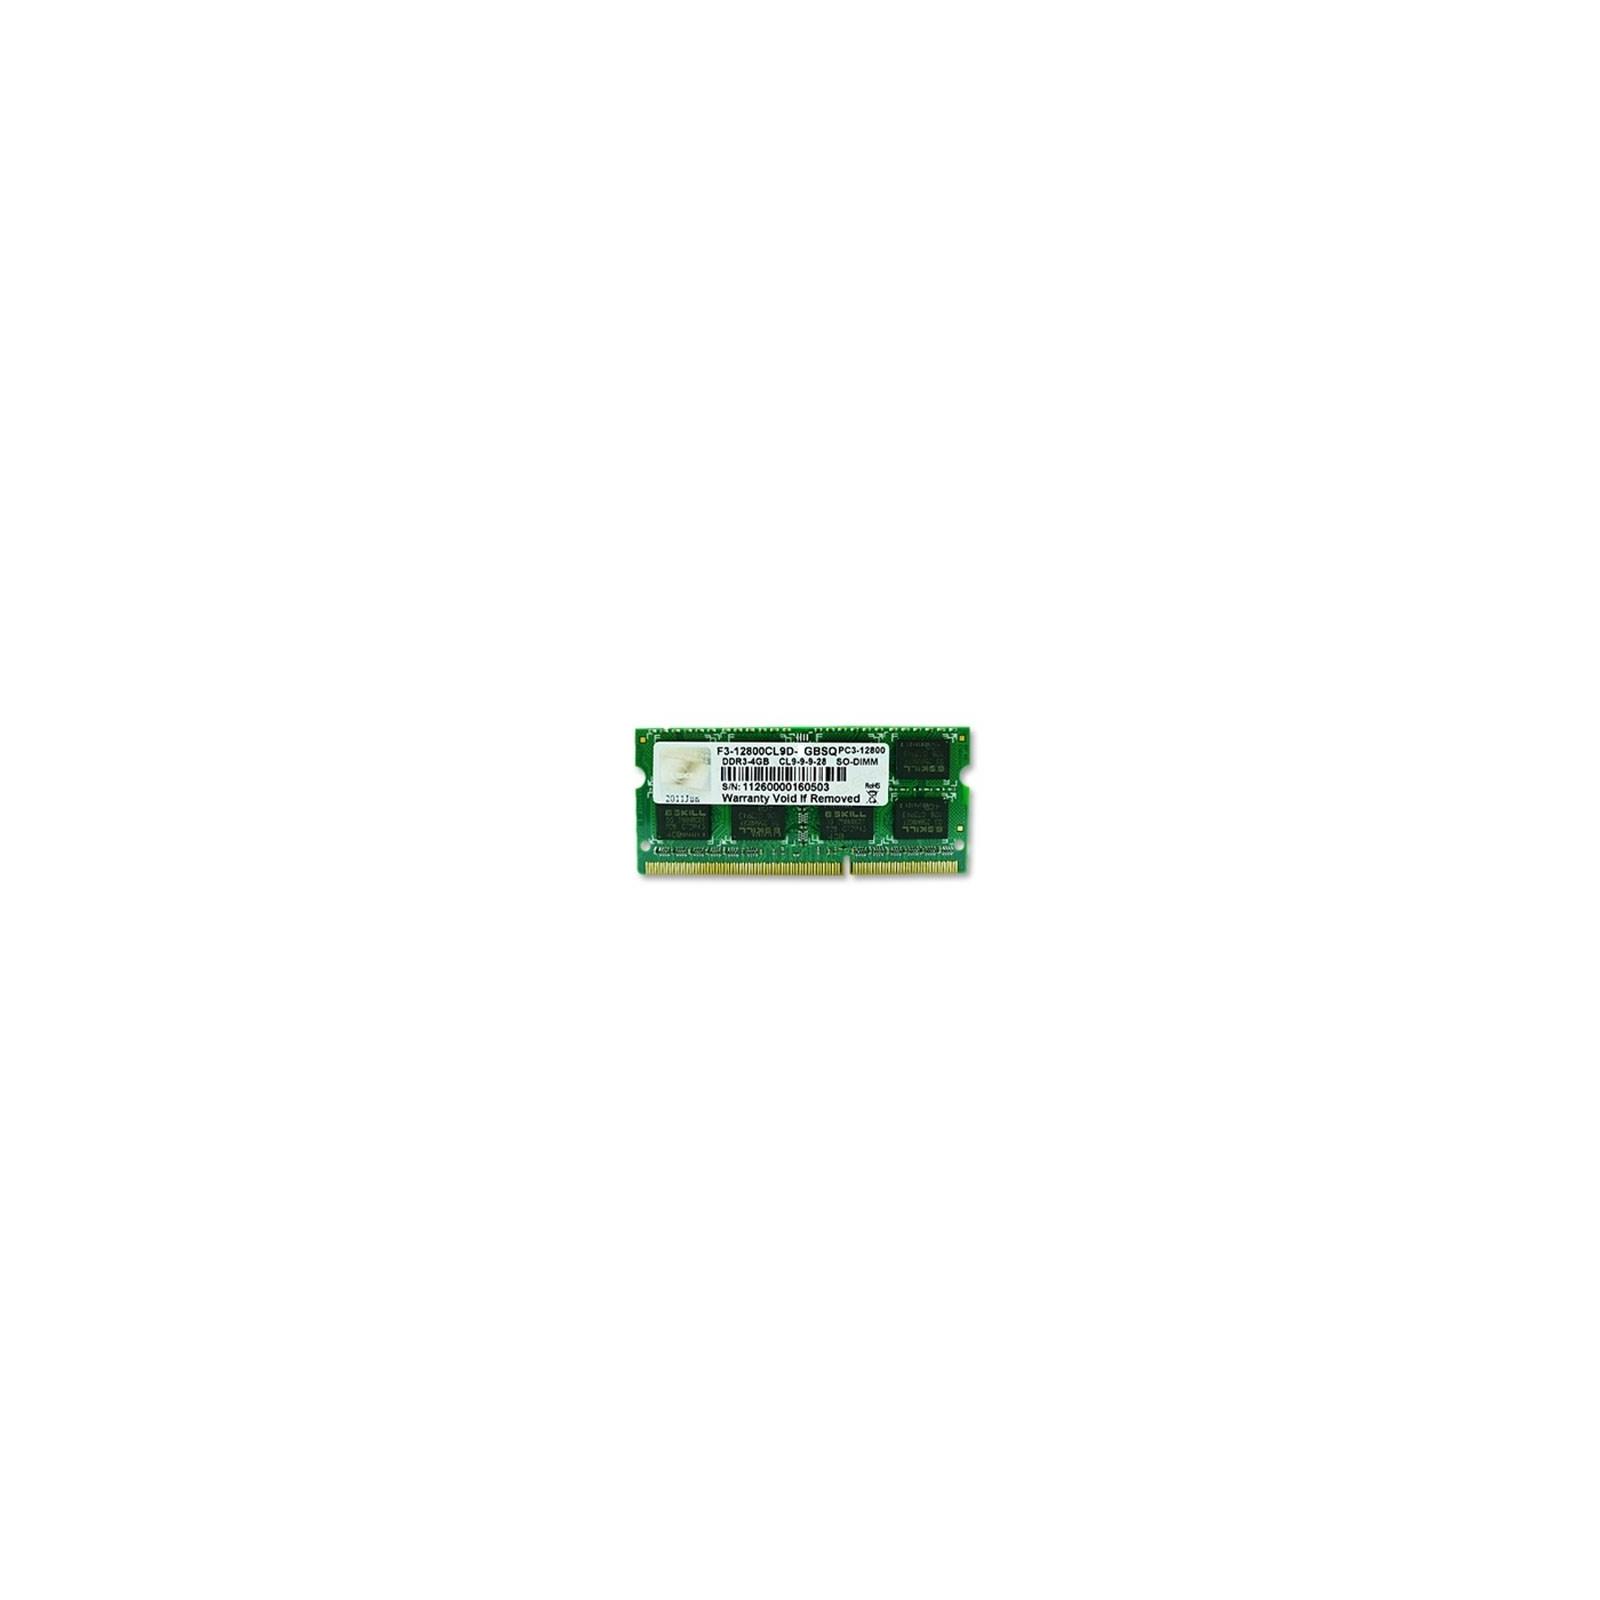 Модуль памяти для ноутбука SoDIMM DDR3 4GB 1600 MHz G.Skill (F3-12800CL9S-4GBSQ)